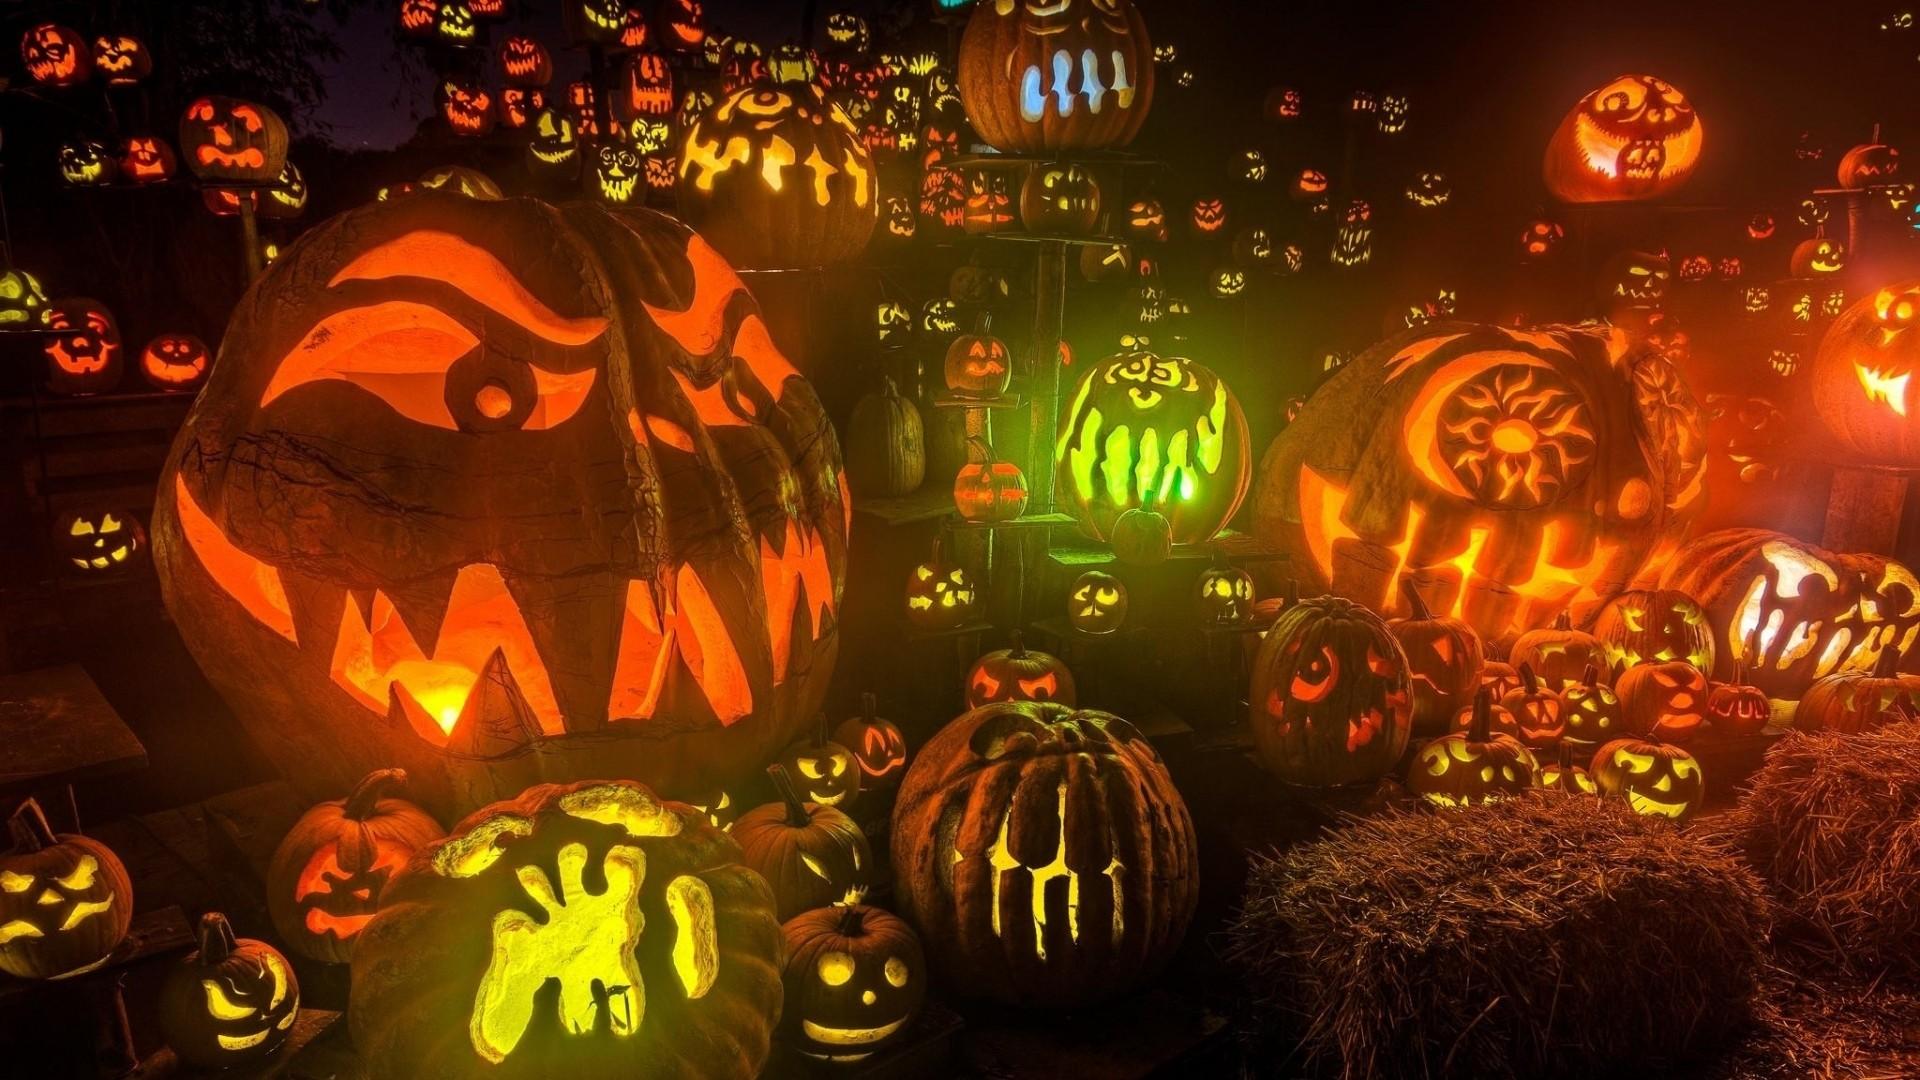 Res: 1920x1080, Kostenlos Halloween Wallpaper Hd in Kostenlose Halloween Bilder